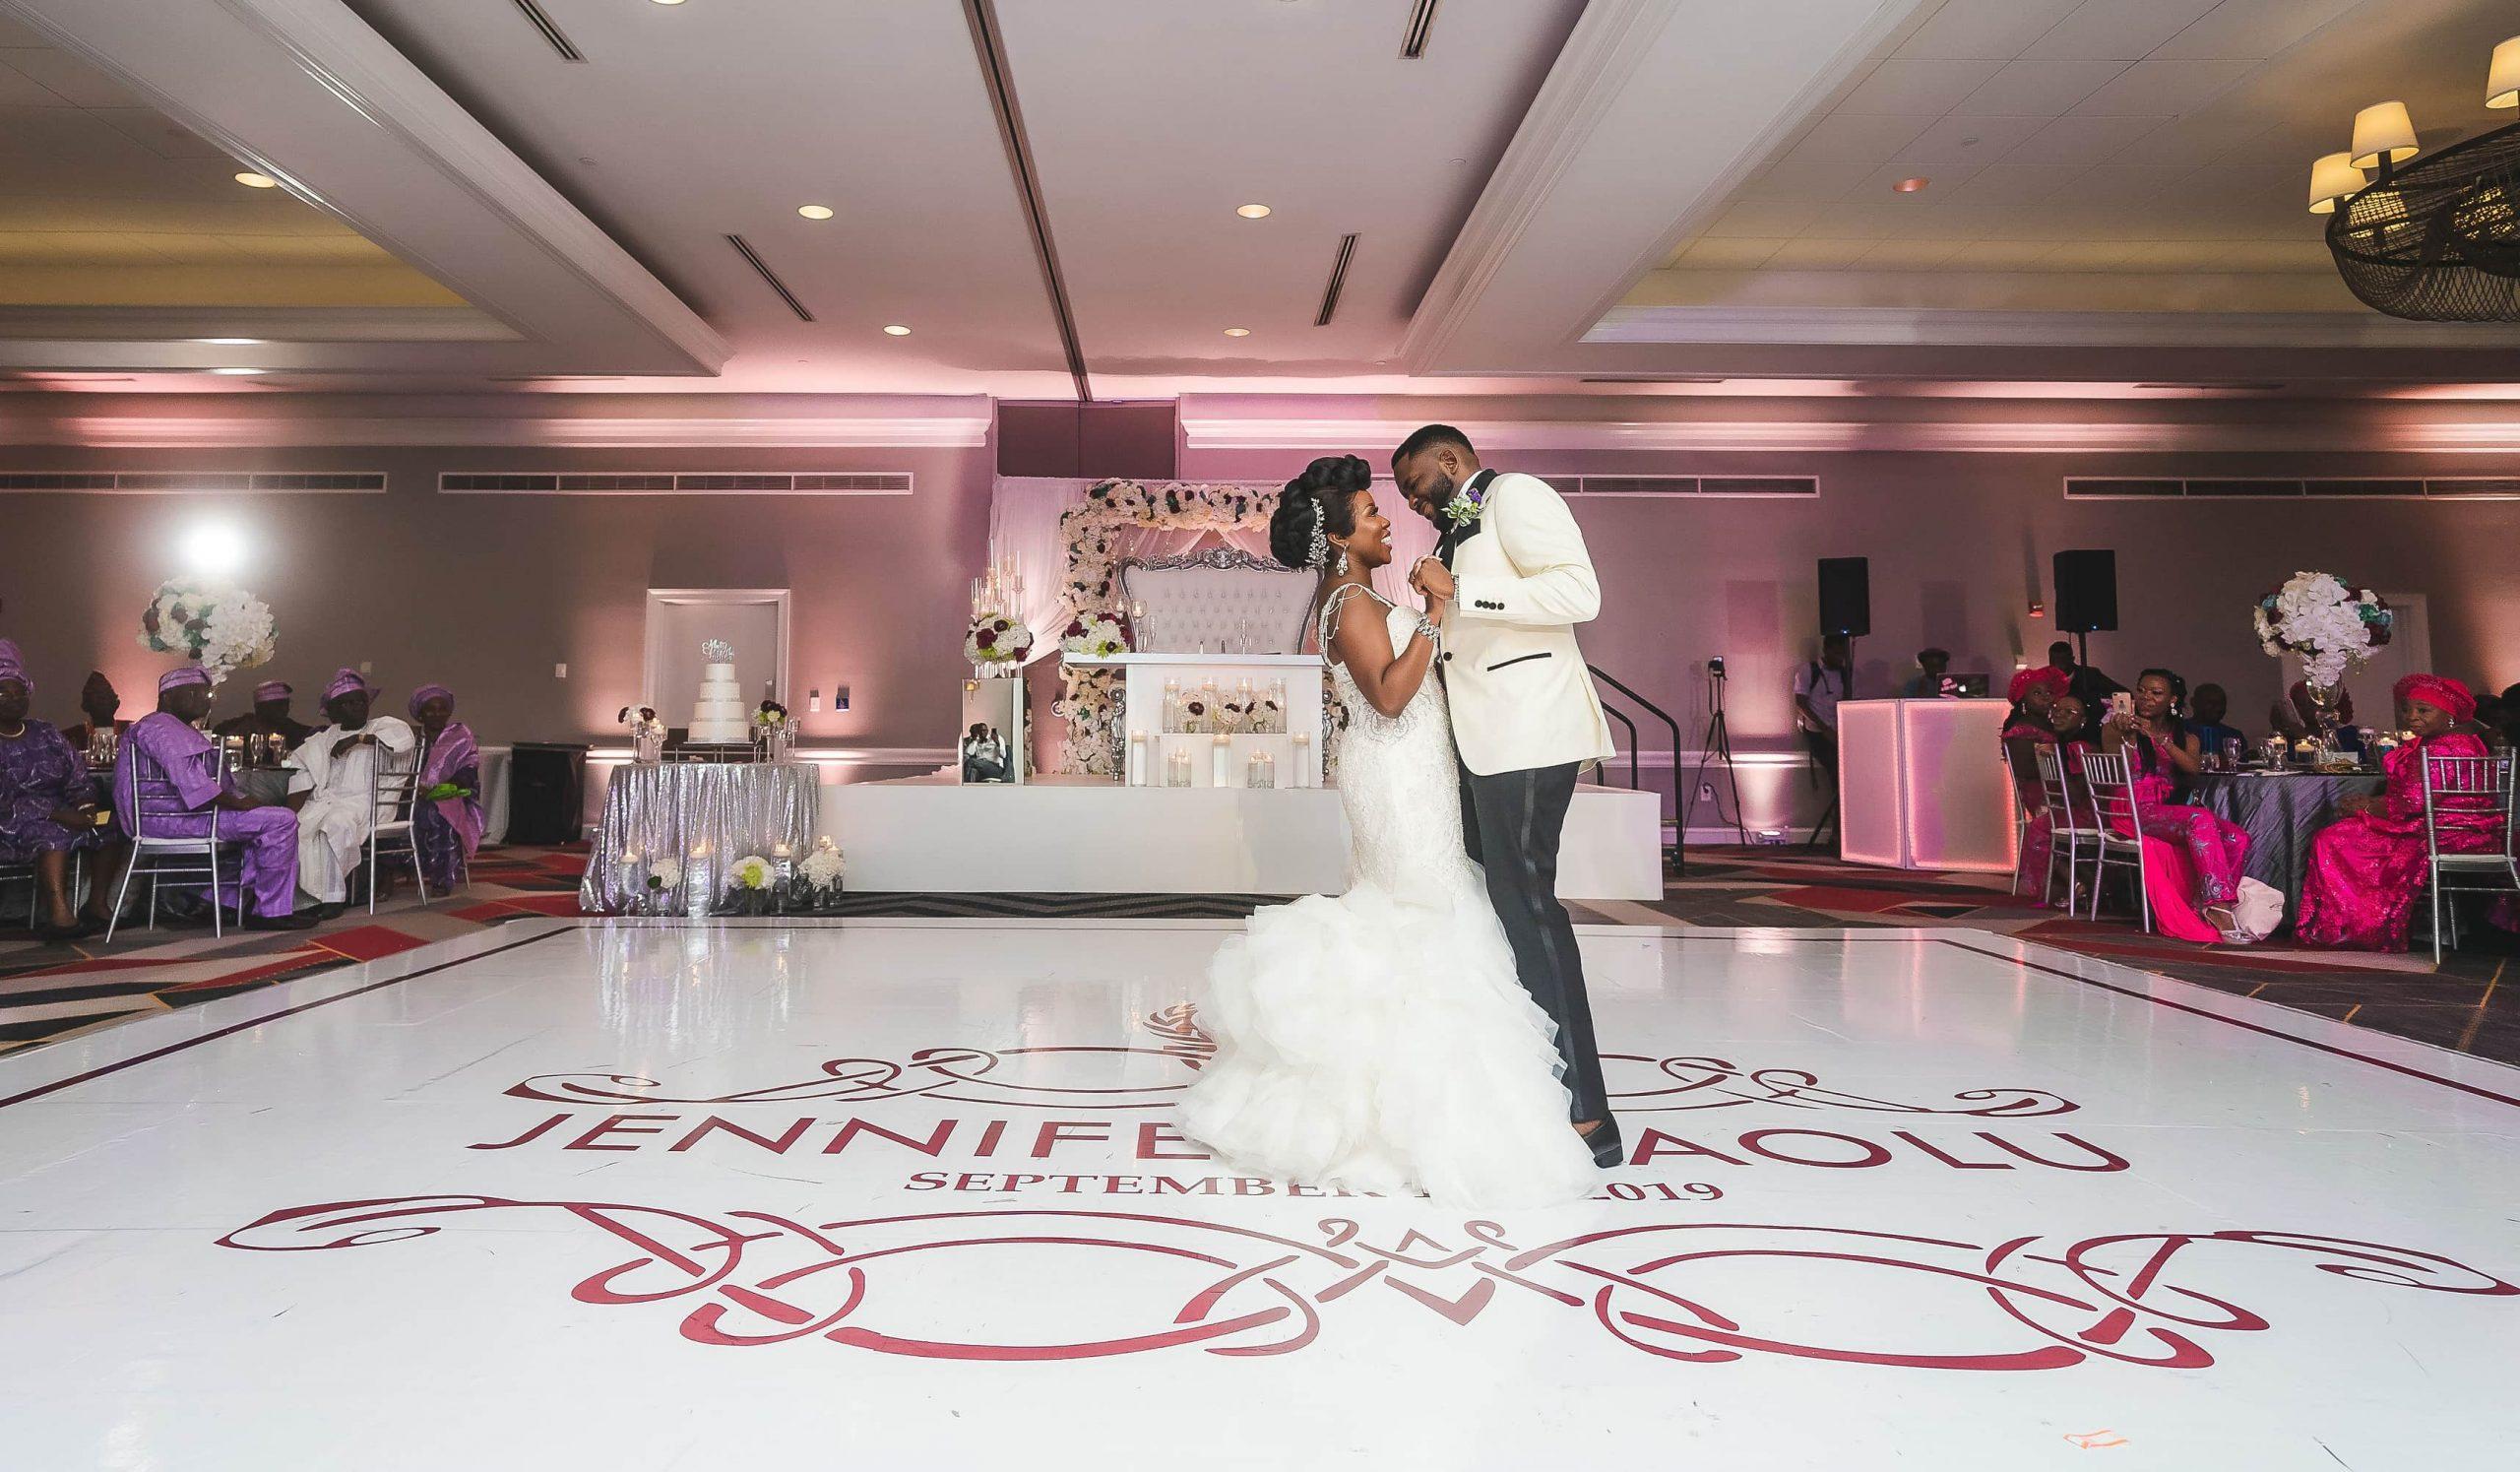 Dance-Floor-Decal-Wrap-Custom-Wedding-White-Stage-Cover-Design-Portable-Dance-Floor-Rental-Portable-Stage-Rental-Event-Stage-Lighting-Selfie-Mirror-Photo-Booth